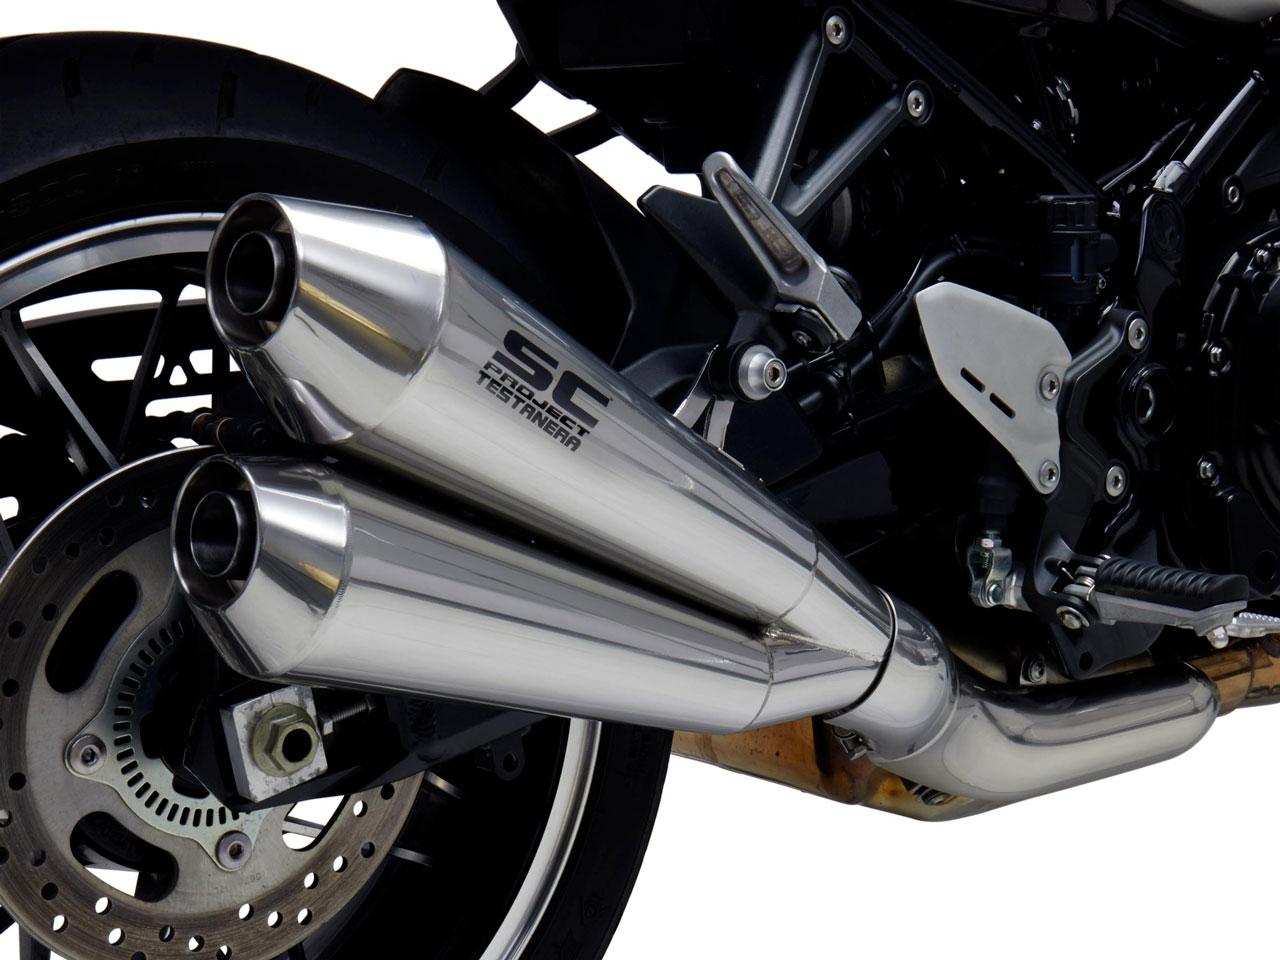 Kawasaki-Z900RS-Testanera_Scarico_1280x960px_Web